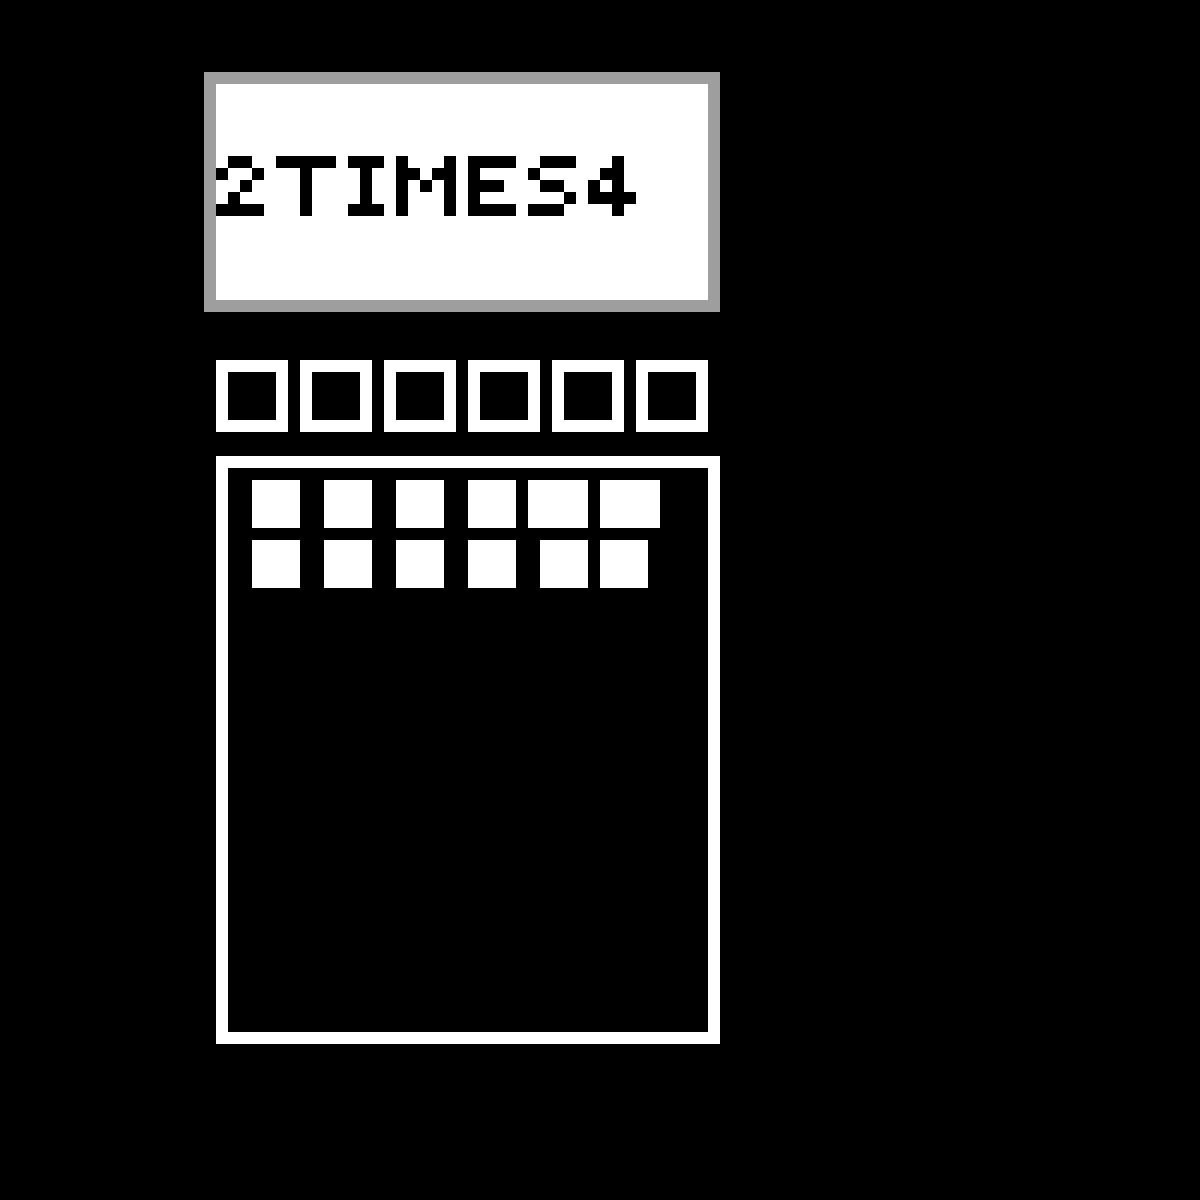 calculator by KINGCREEPER555